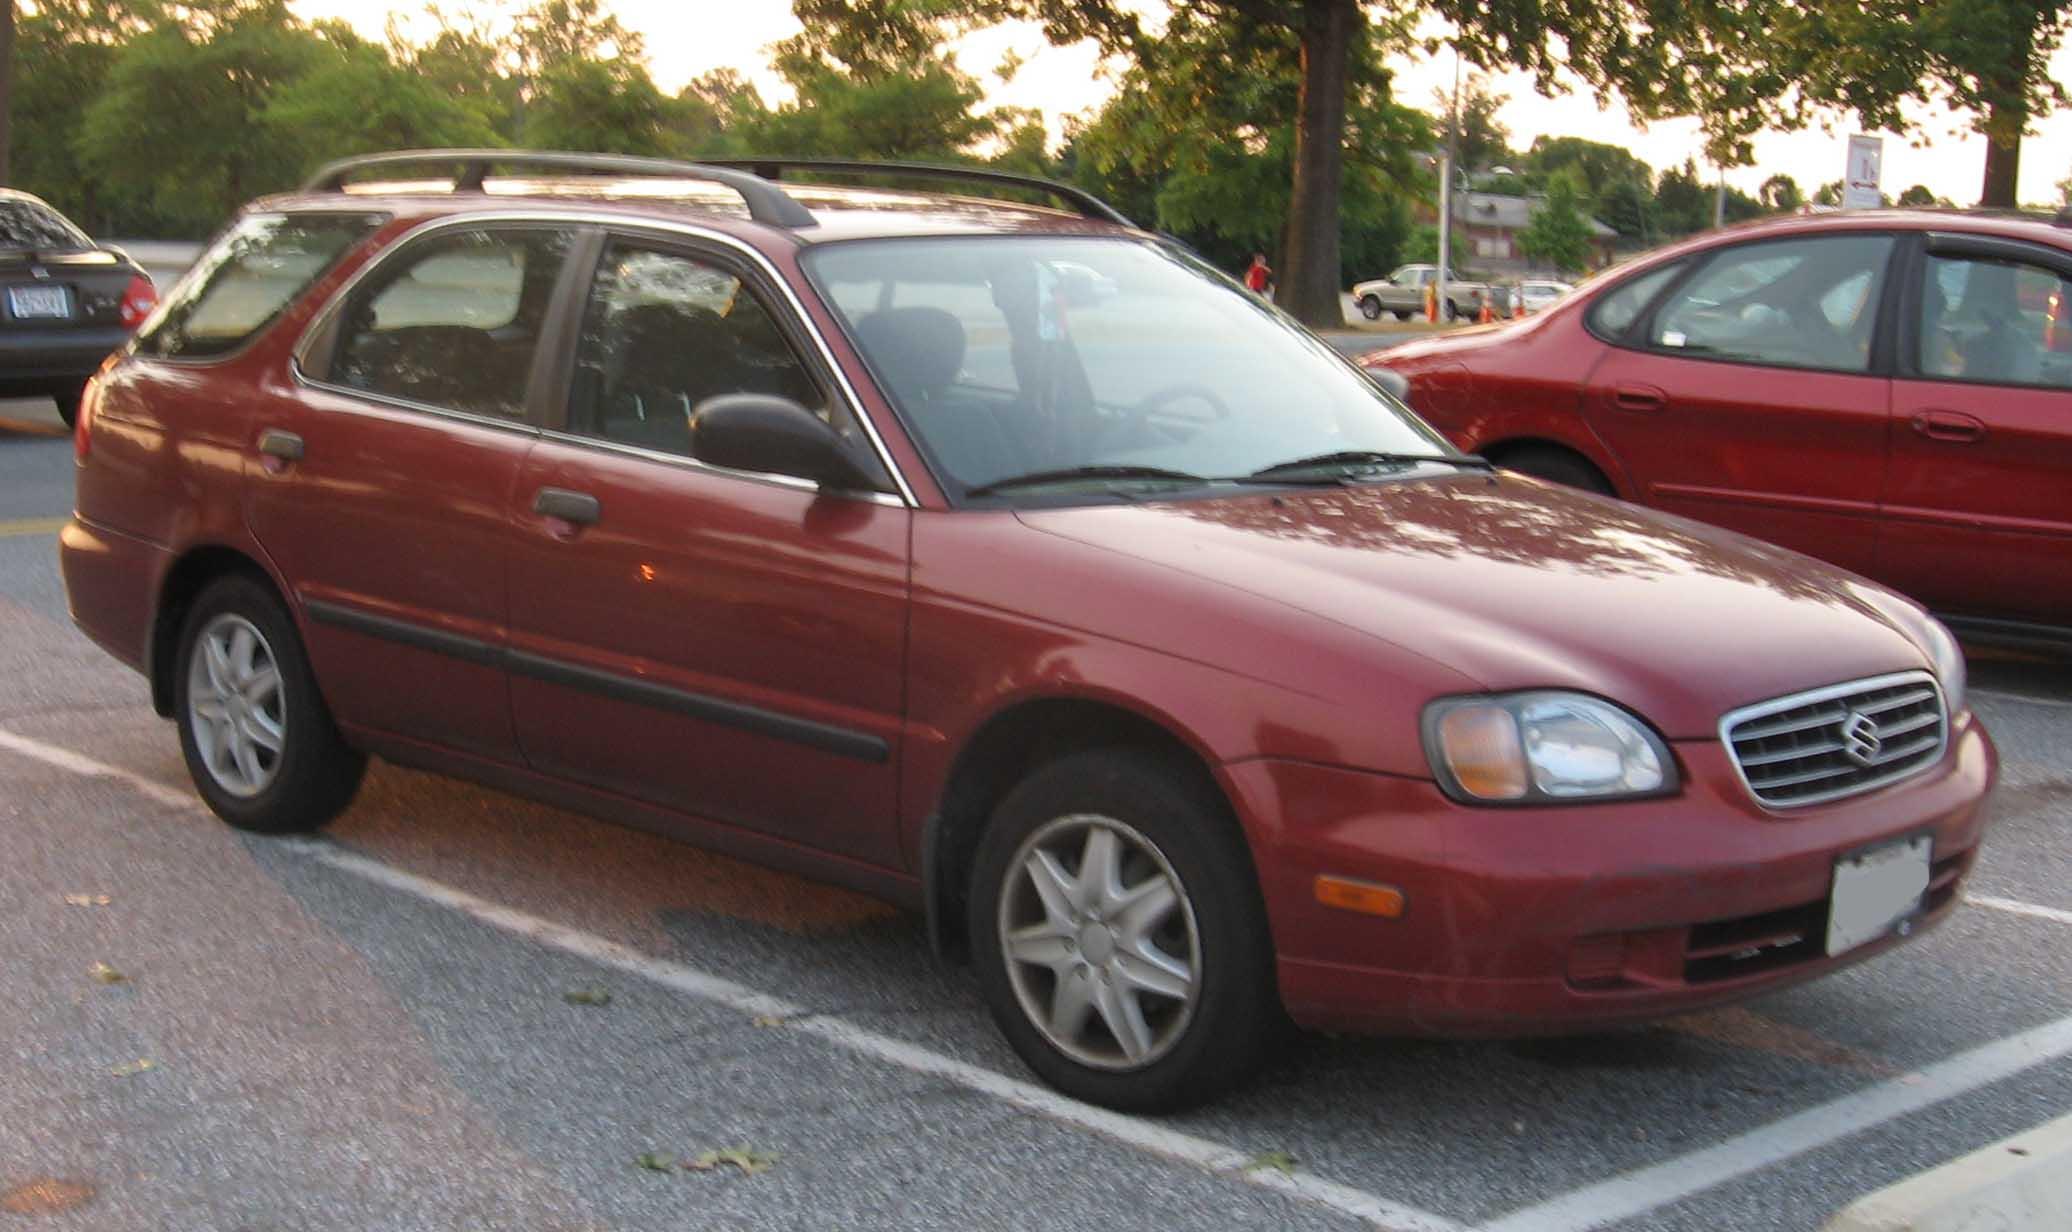 File:1999-02 Suzuki Esteem Wagon.jpg - Wikimedia Commons